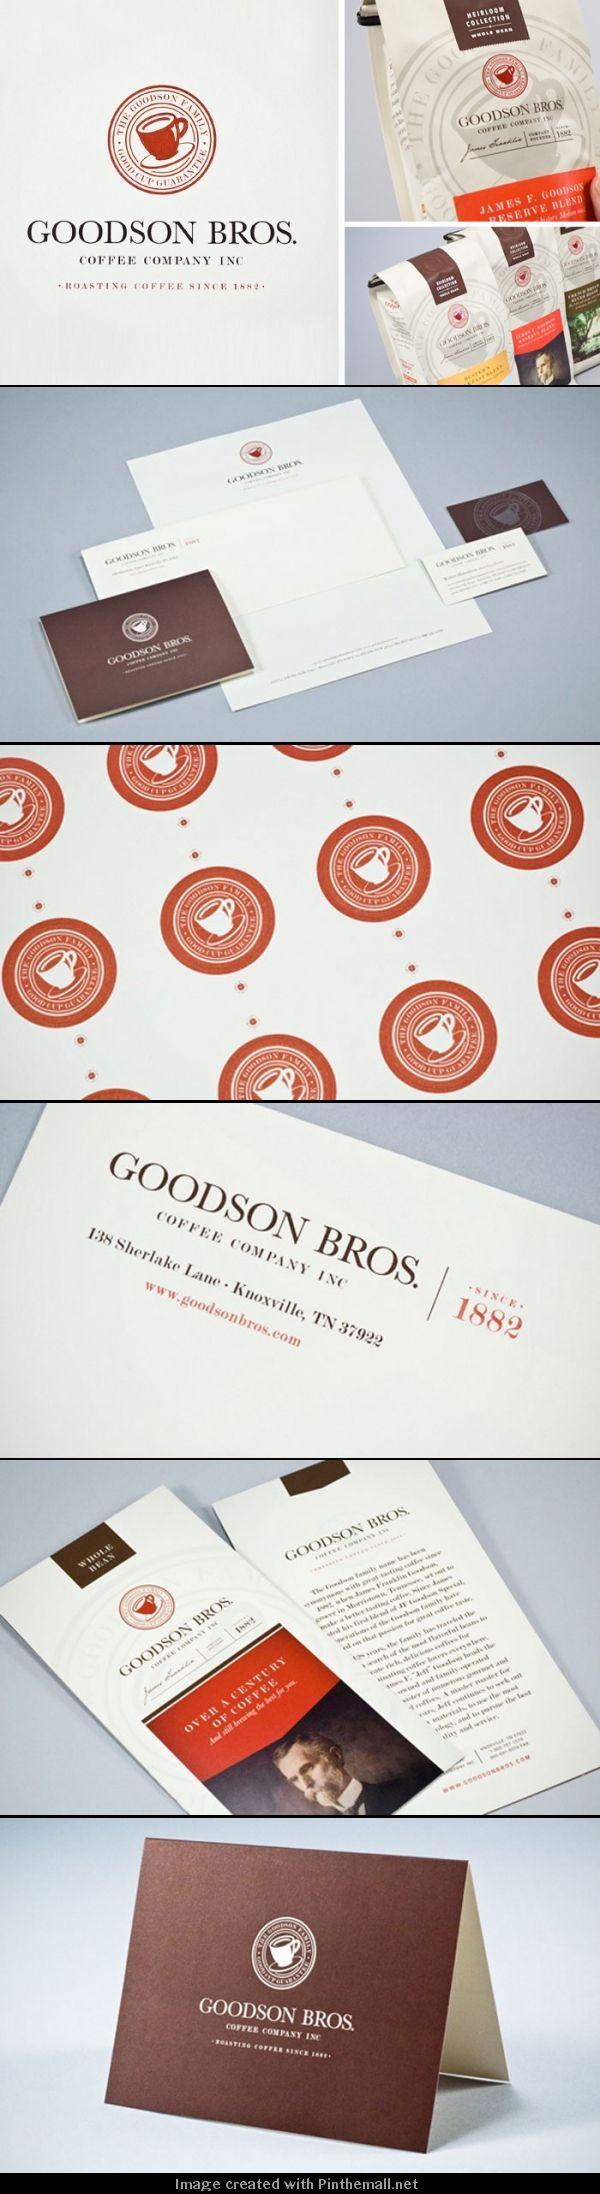 identity / Goodson Bros. Coffee Company Inc.